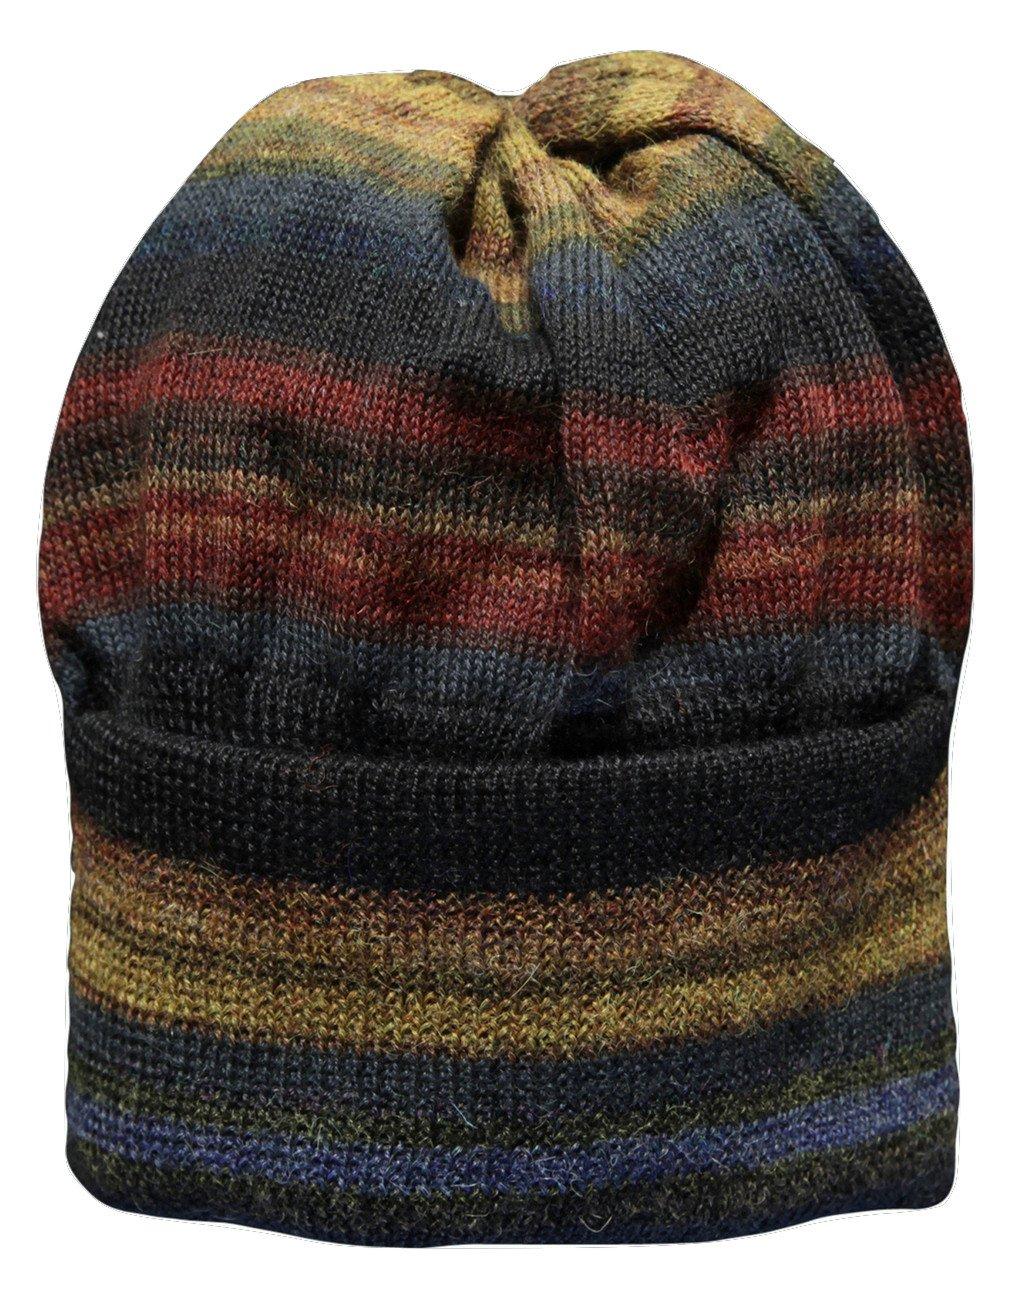 Invisible World Women's Alpaca Wool Hat Knit Unisex Beanie Winter Chiminea Lg